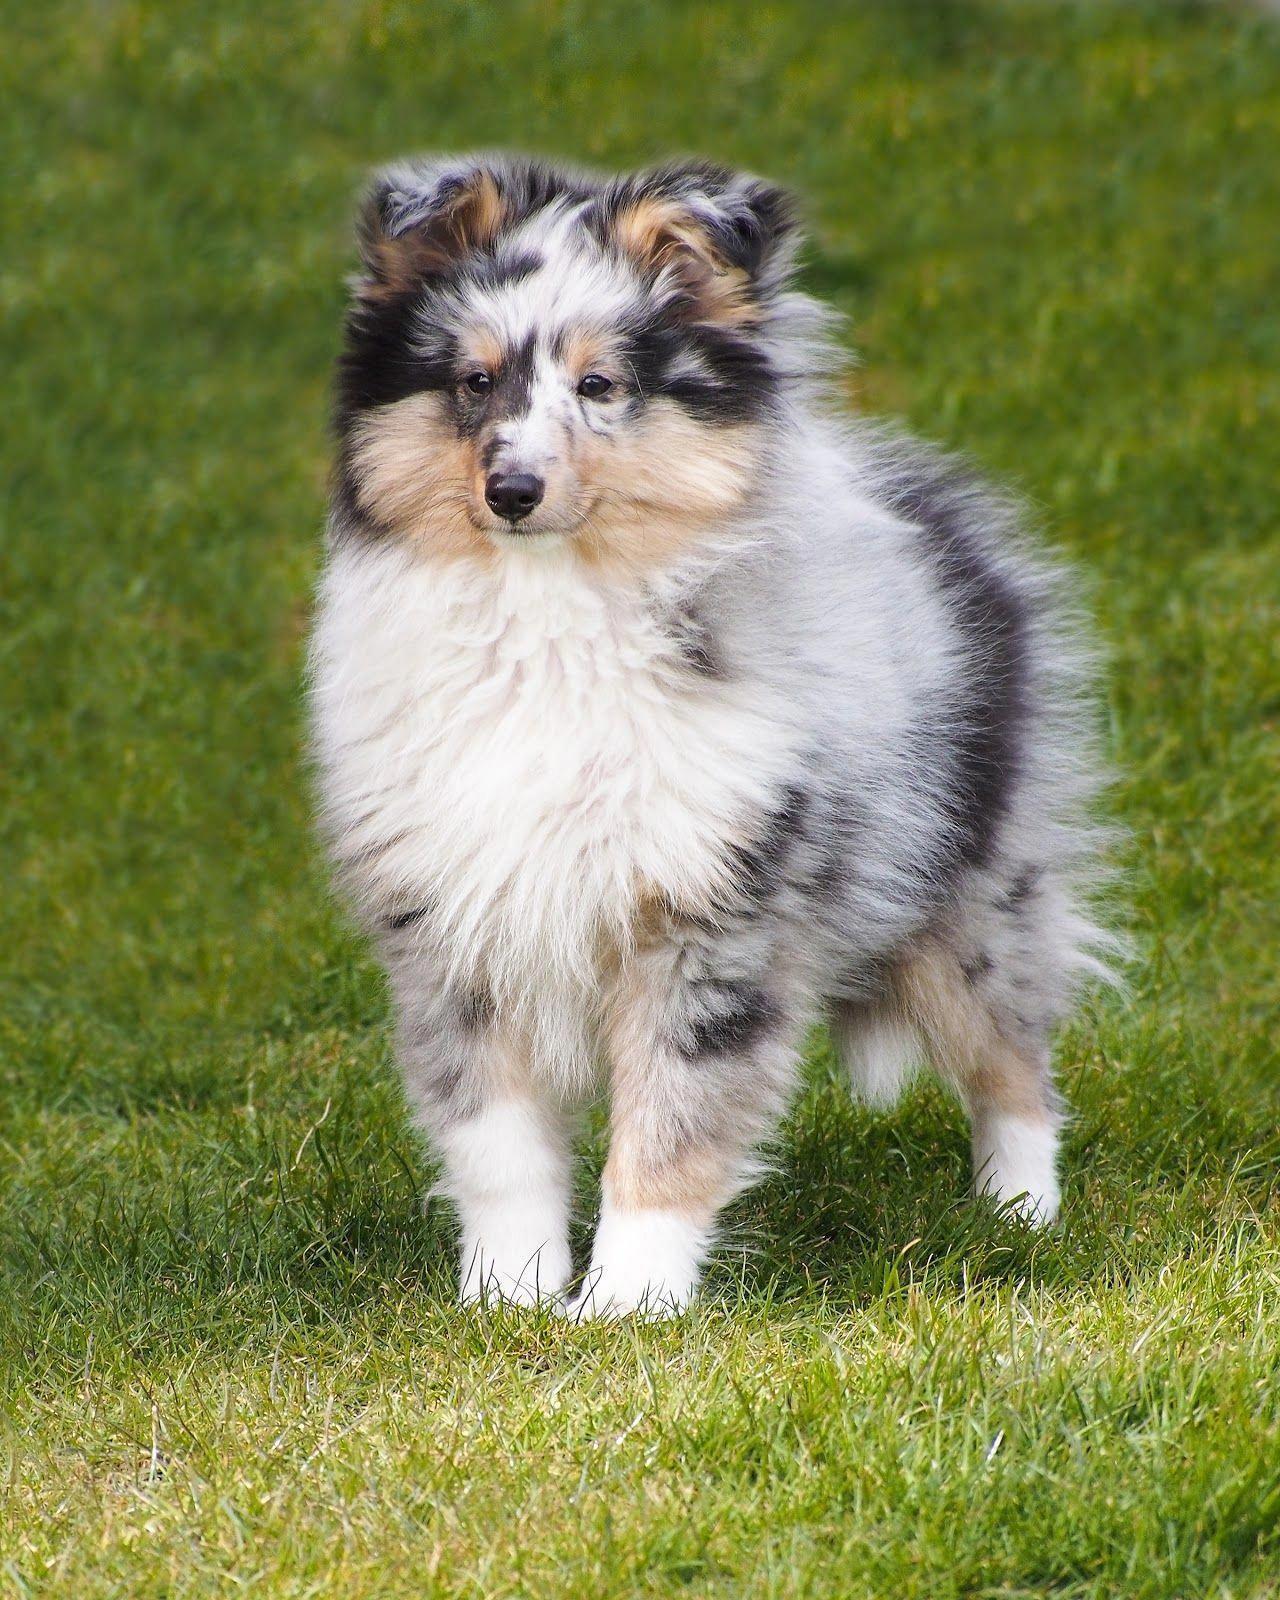 Discover Cute Shetland Sheepdog Temperament Shetlandsheepdogs Shetlandsheepdog Shetlandsheepdogsheltie Shetlandsheepd Mooie Honden Schattige Dieren Honden